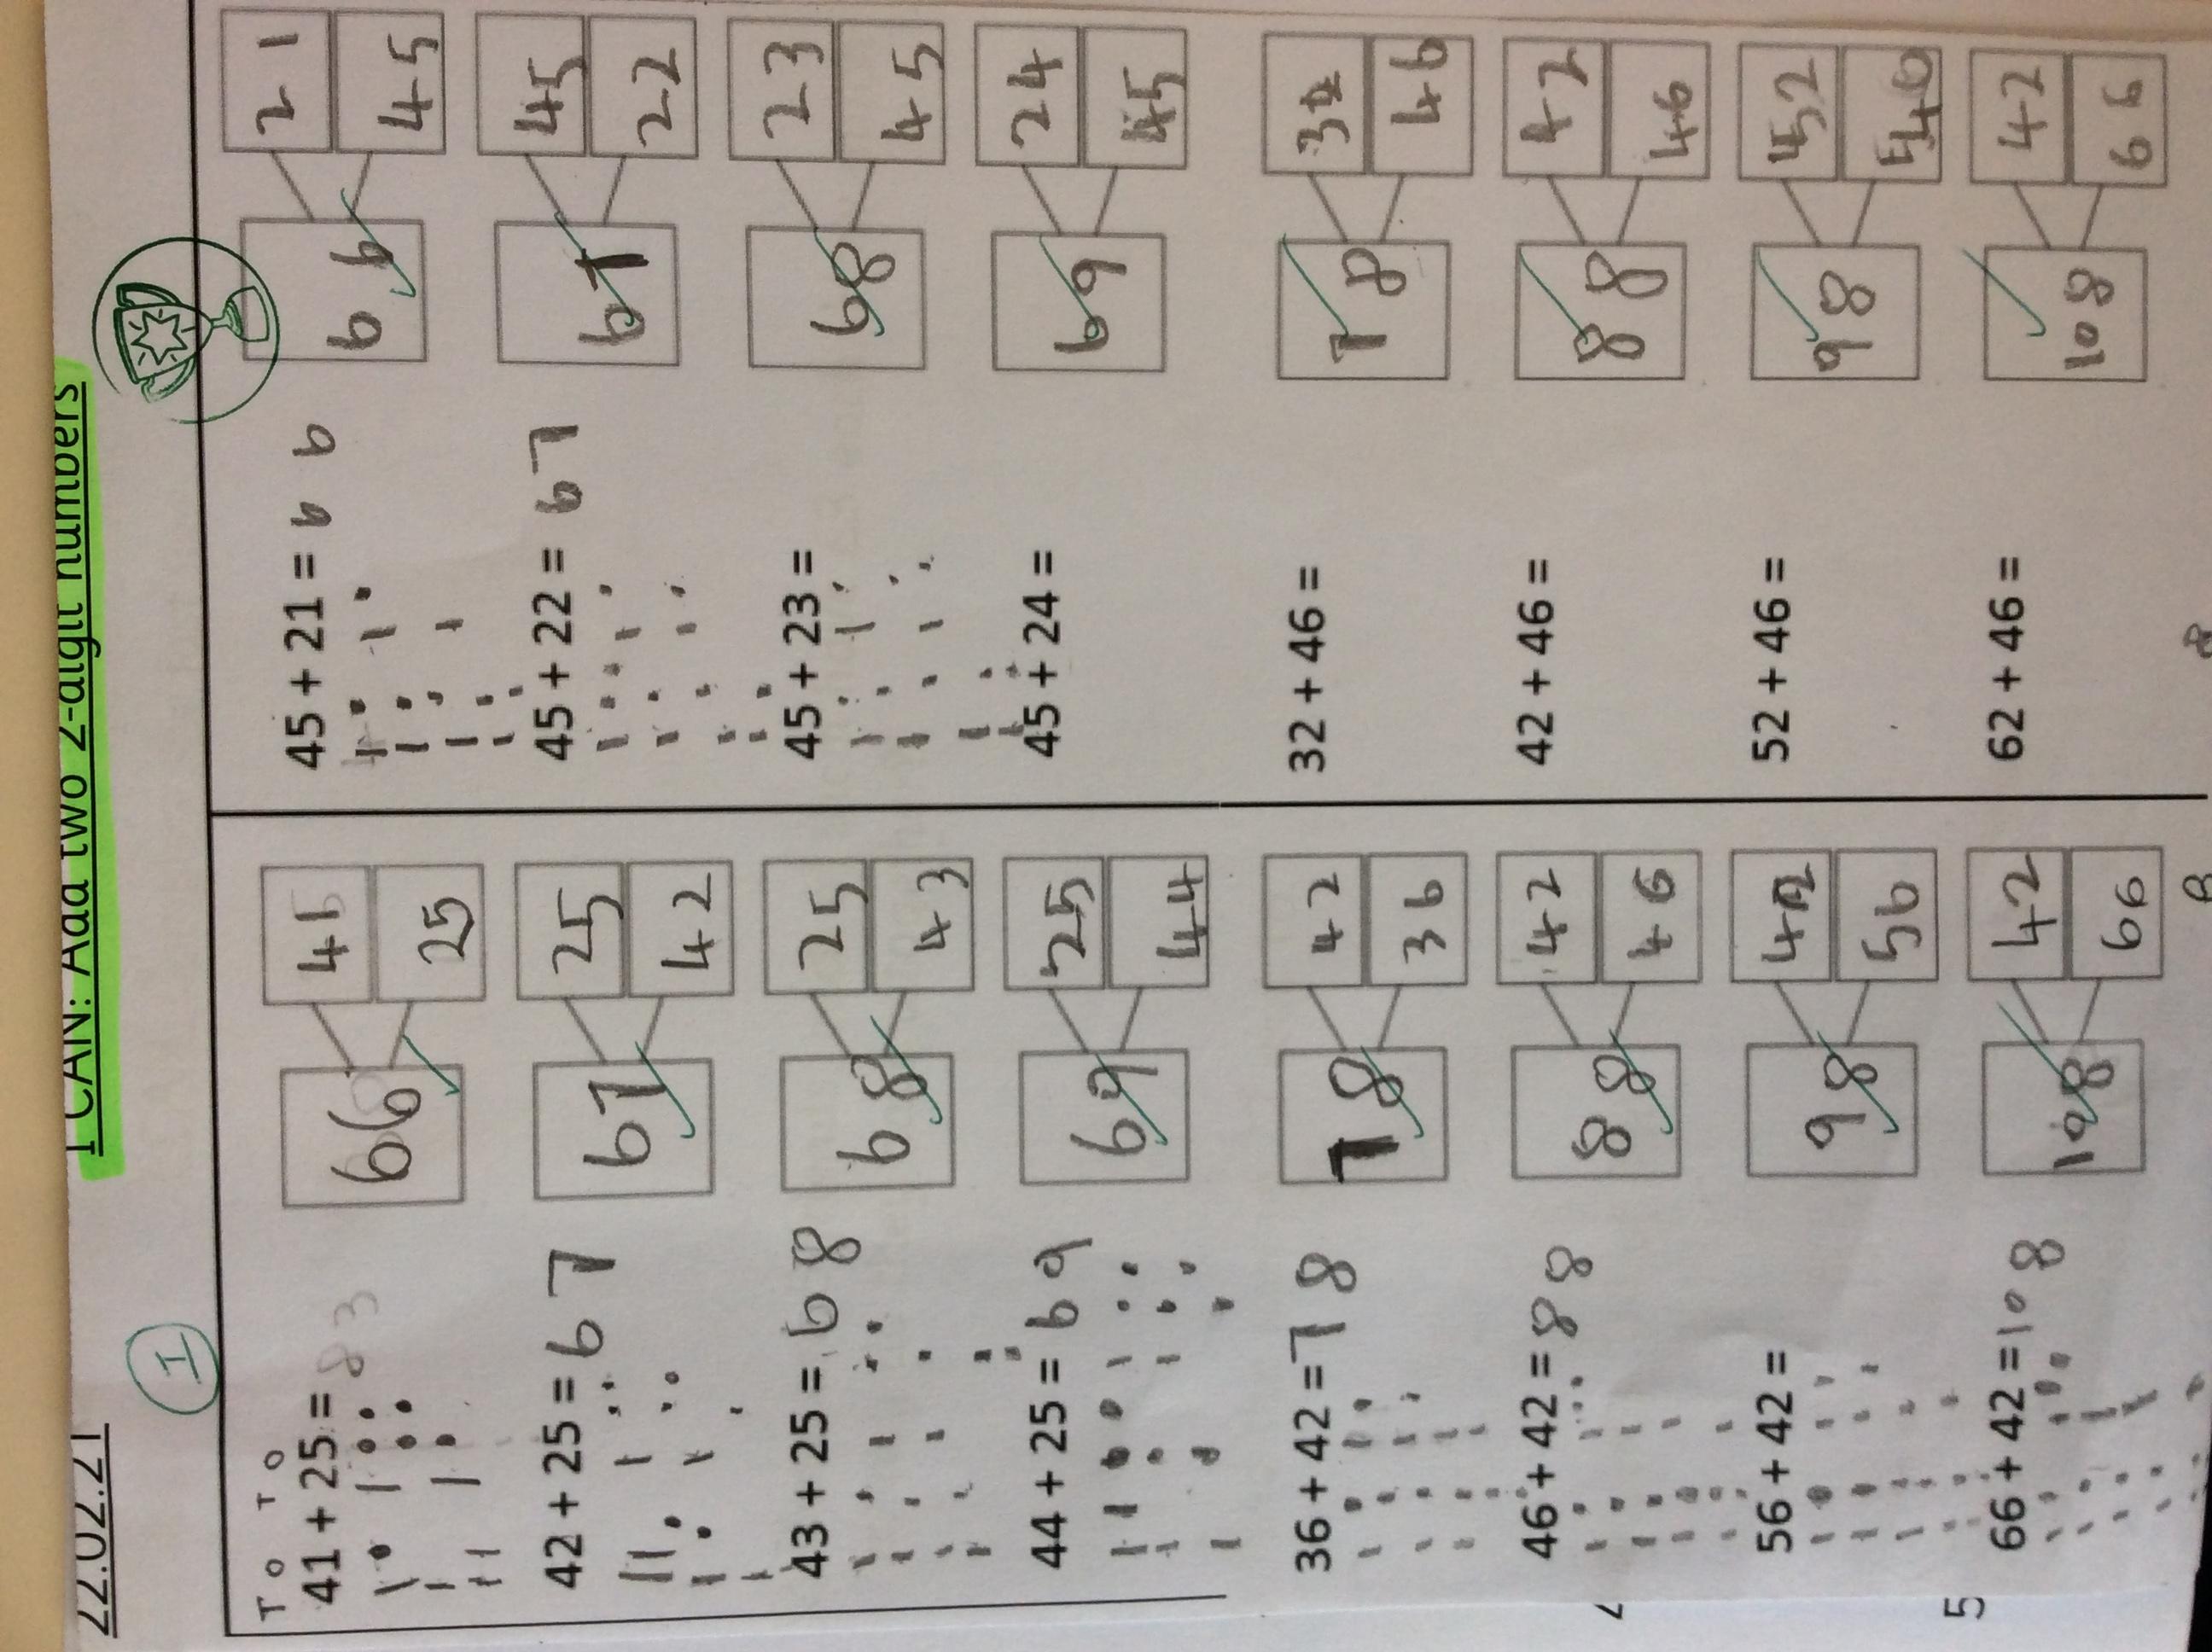 Celestine's incredible maths!